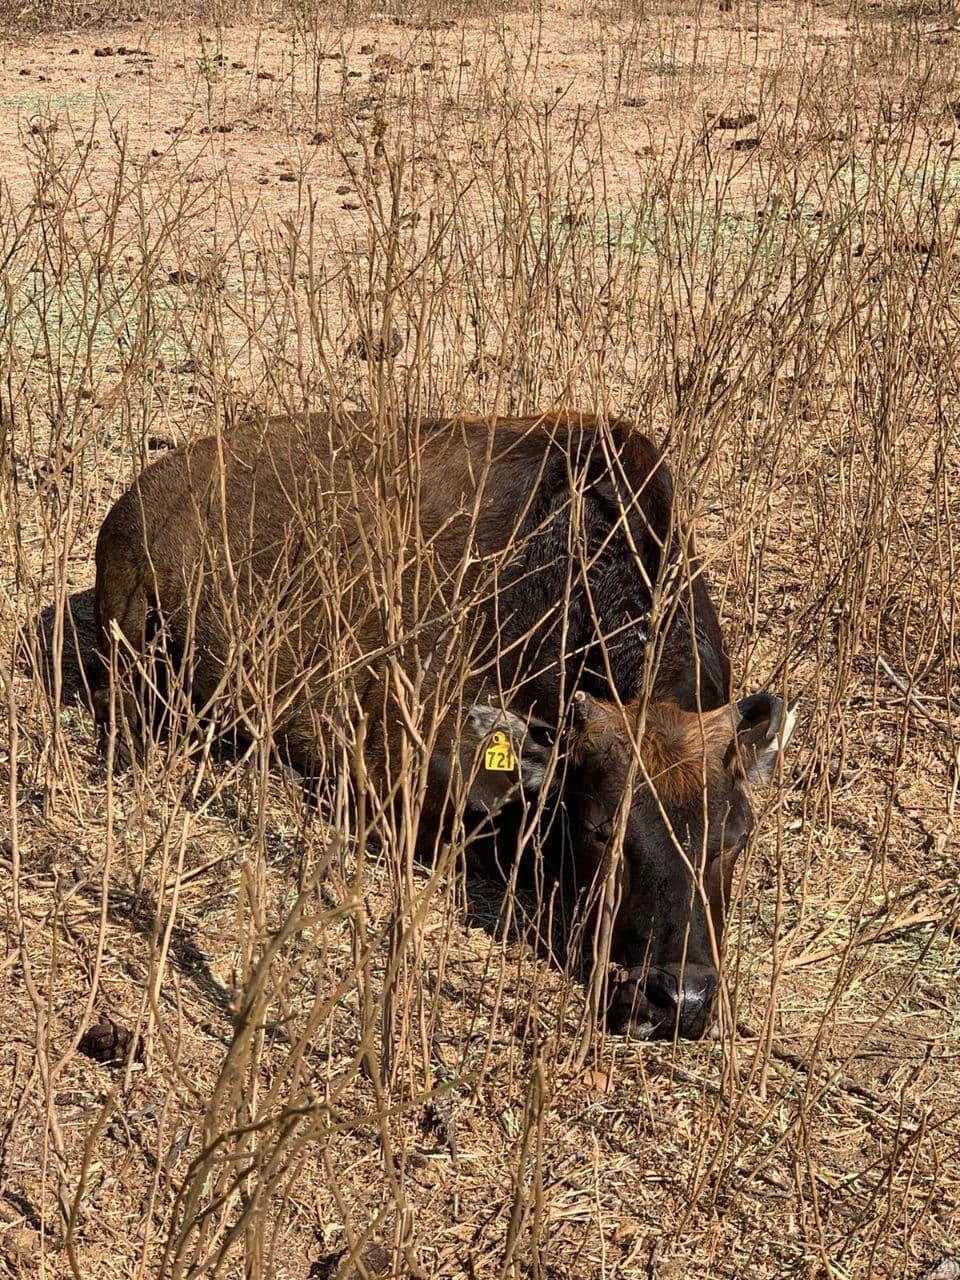 sapi sapi banteng kelaparan perubahan iklim penggurunan